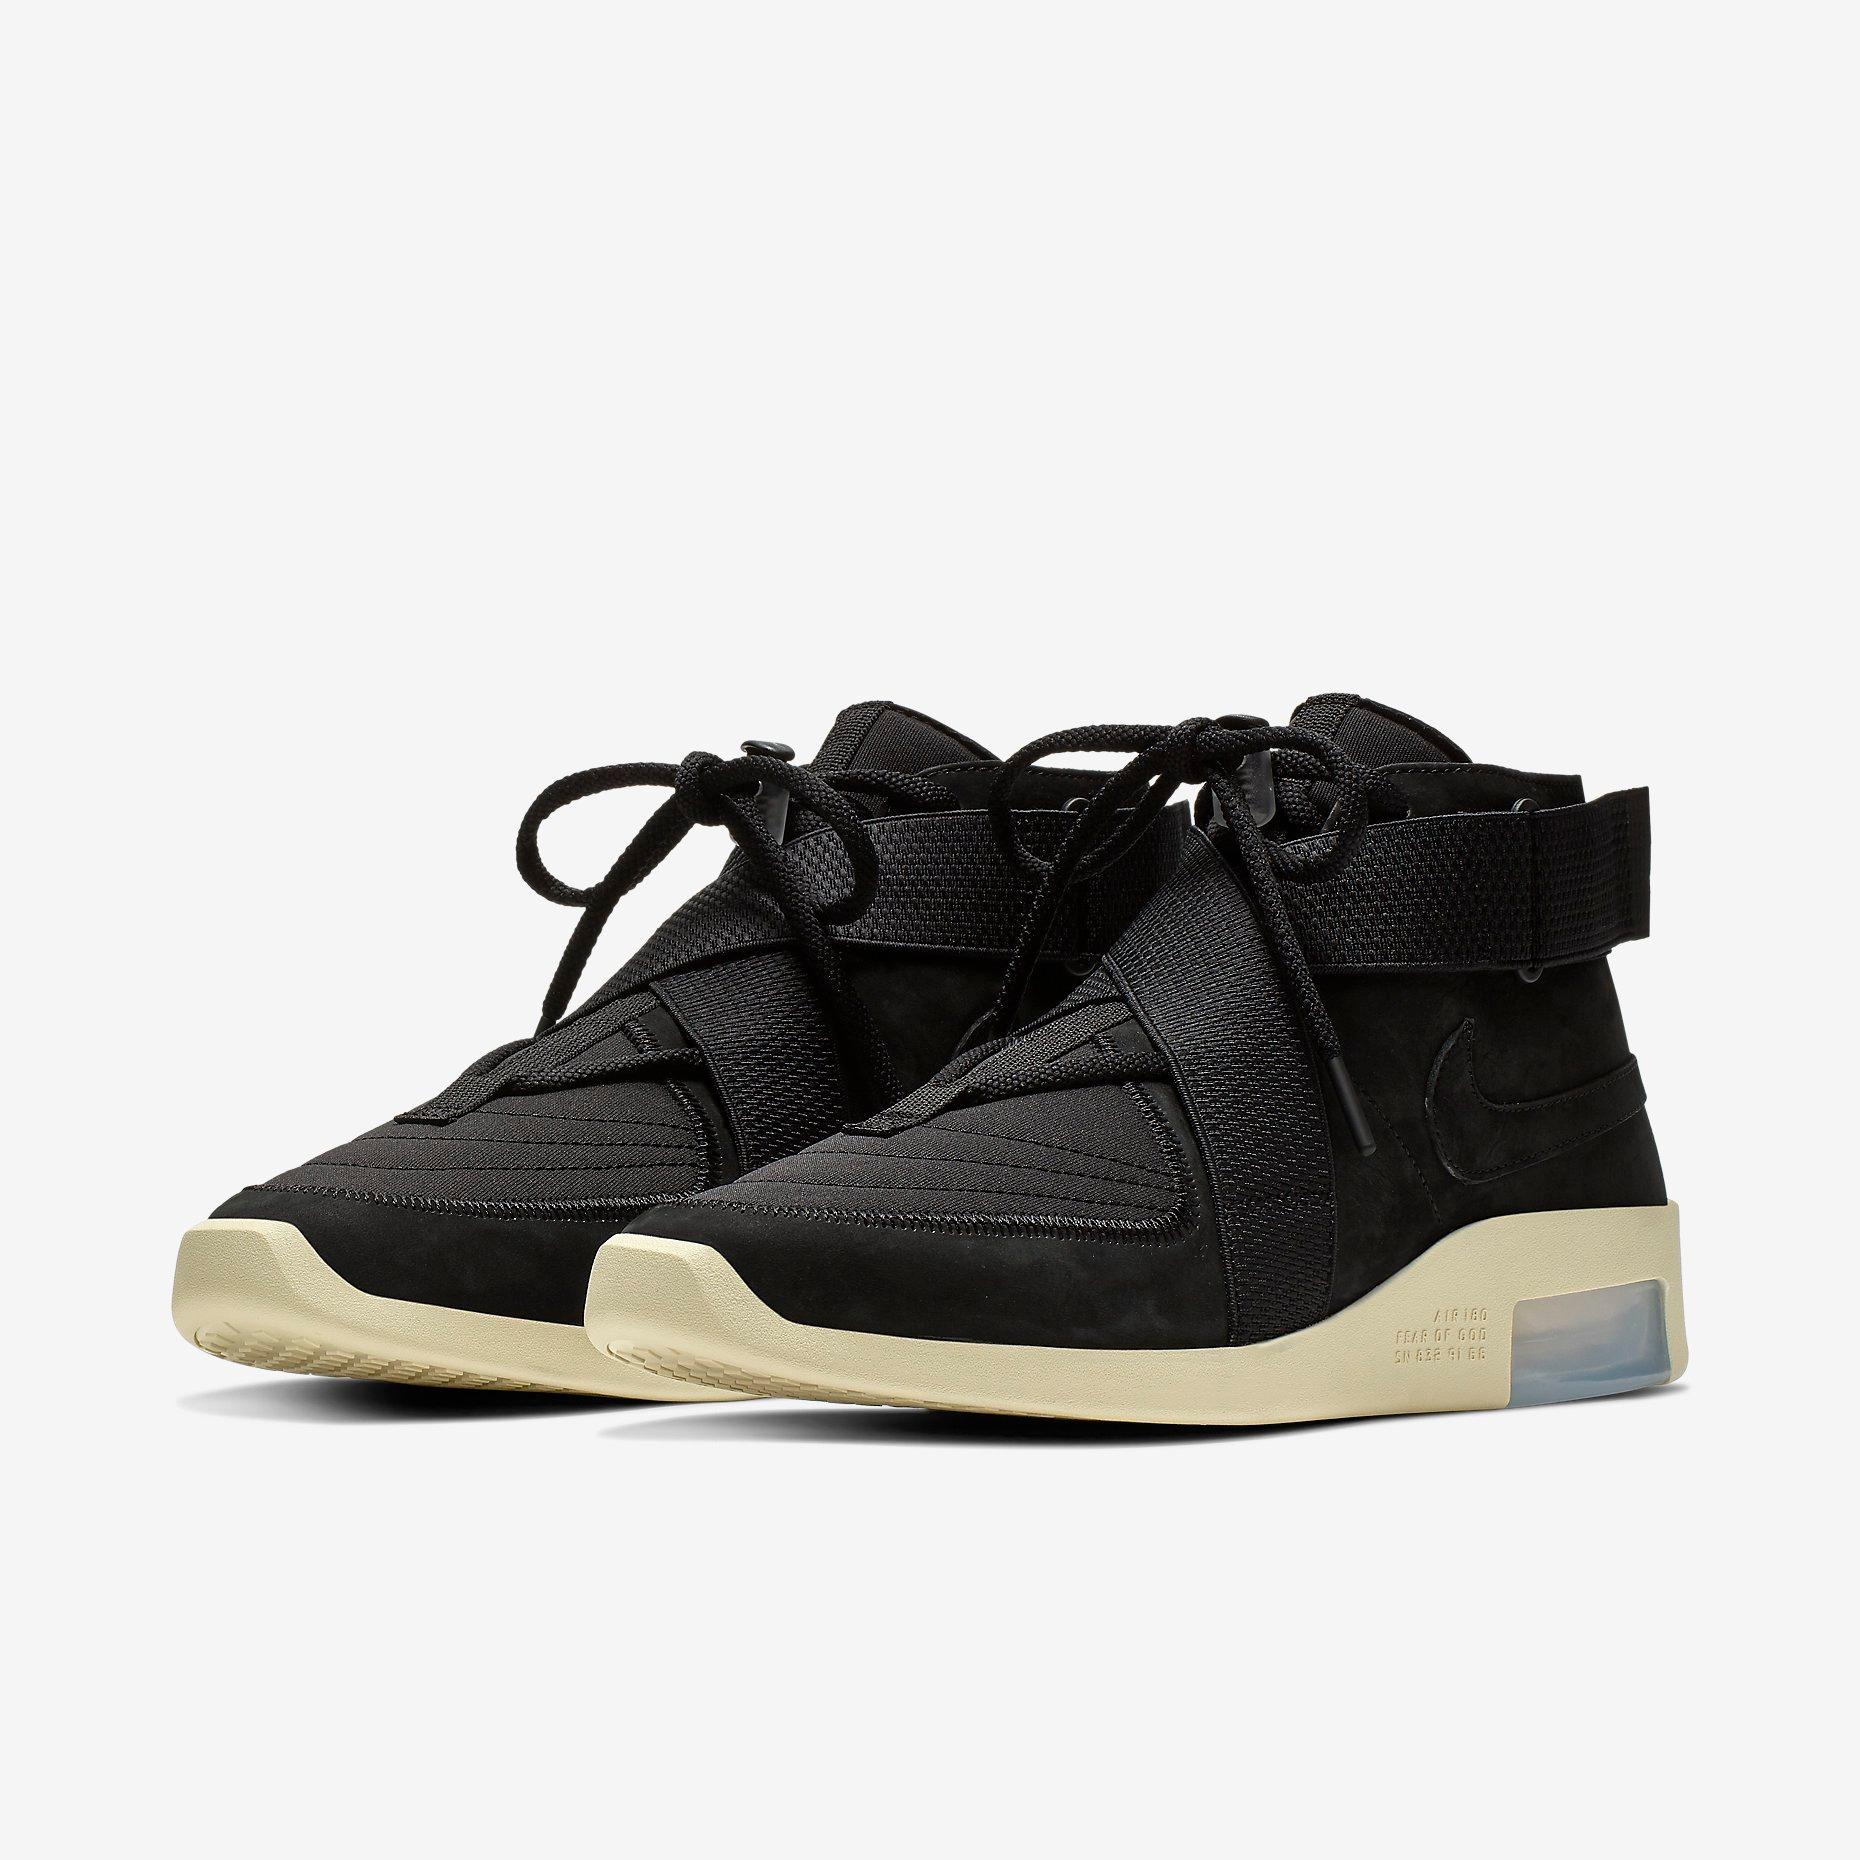 Fear of God x Nike Air 1 Black 3